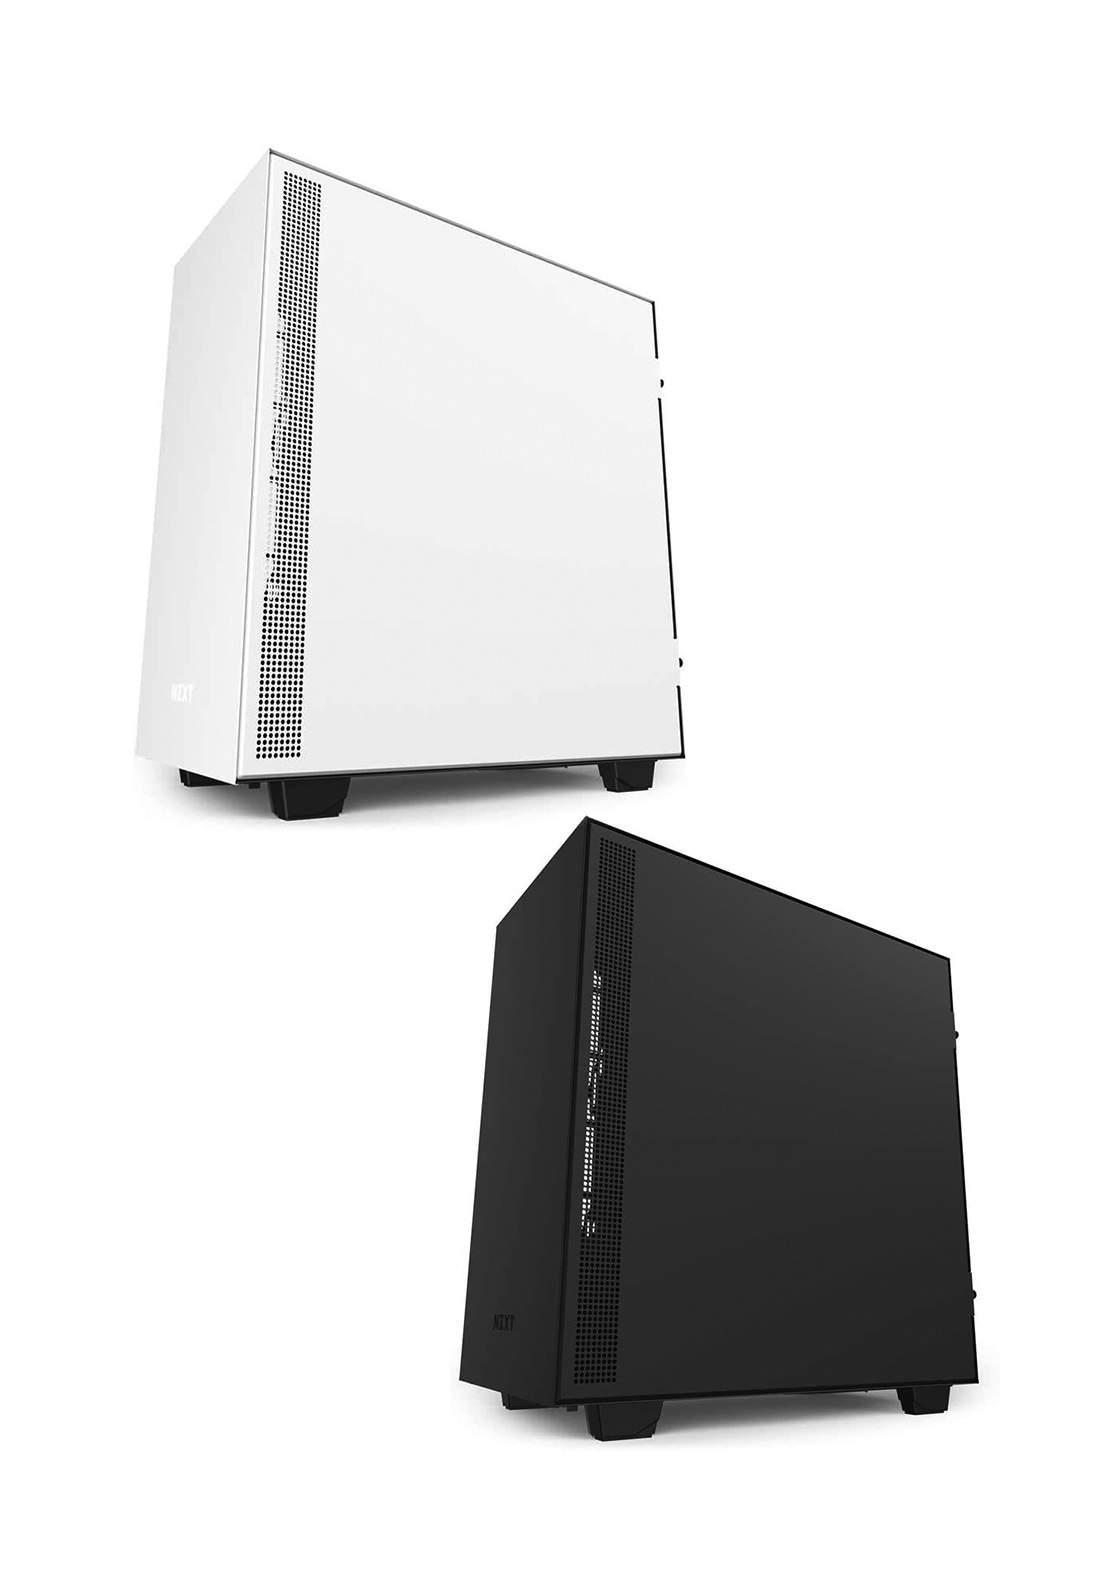 Nzxt H510 Atx Mid Tower Case كيس حاسبة